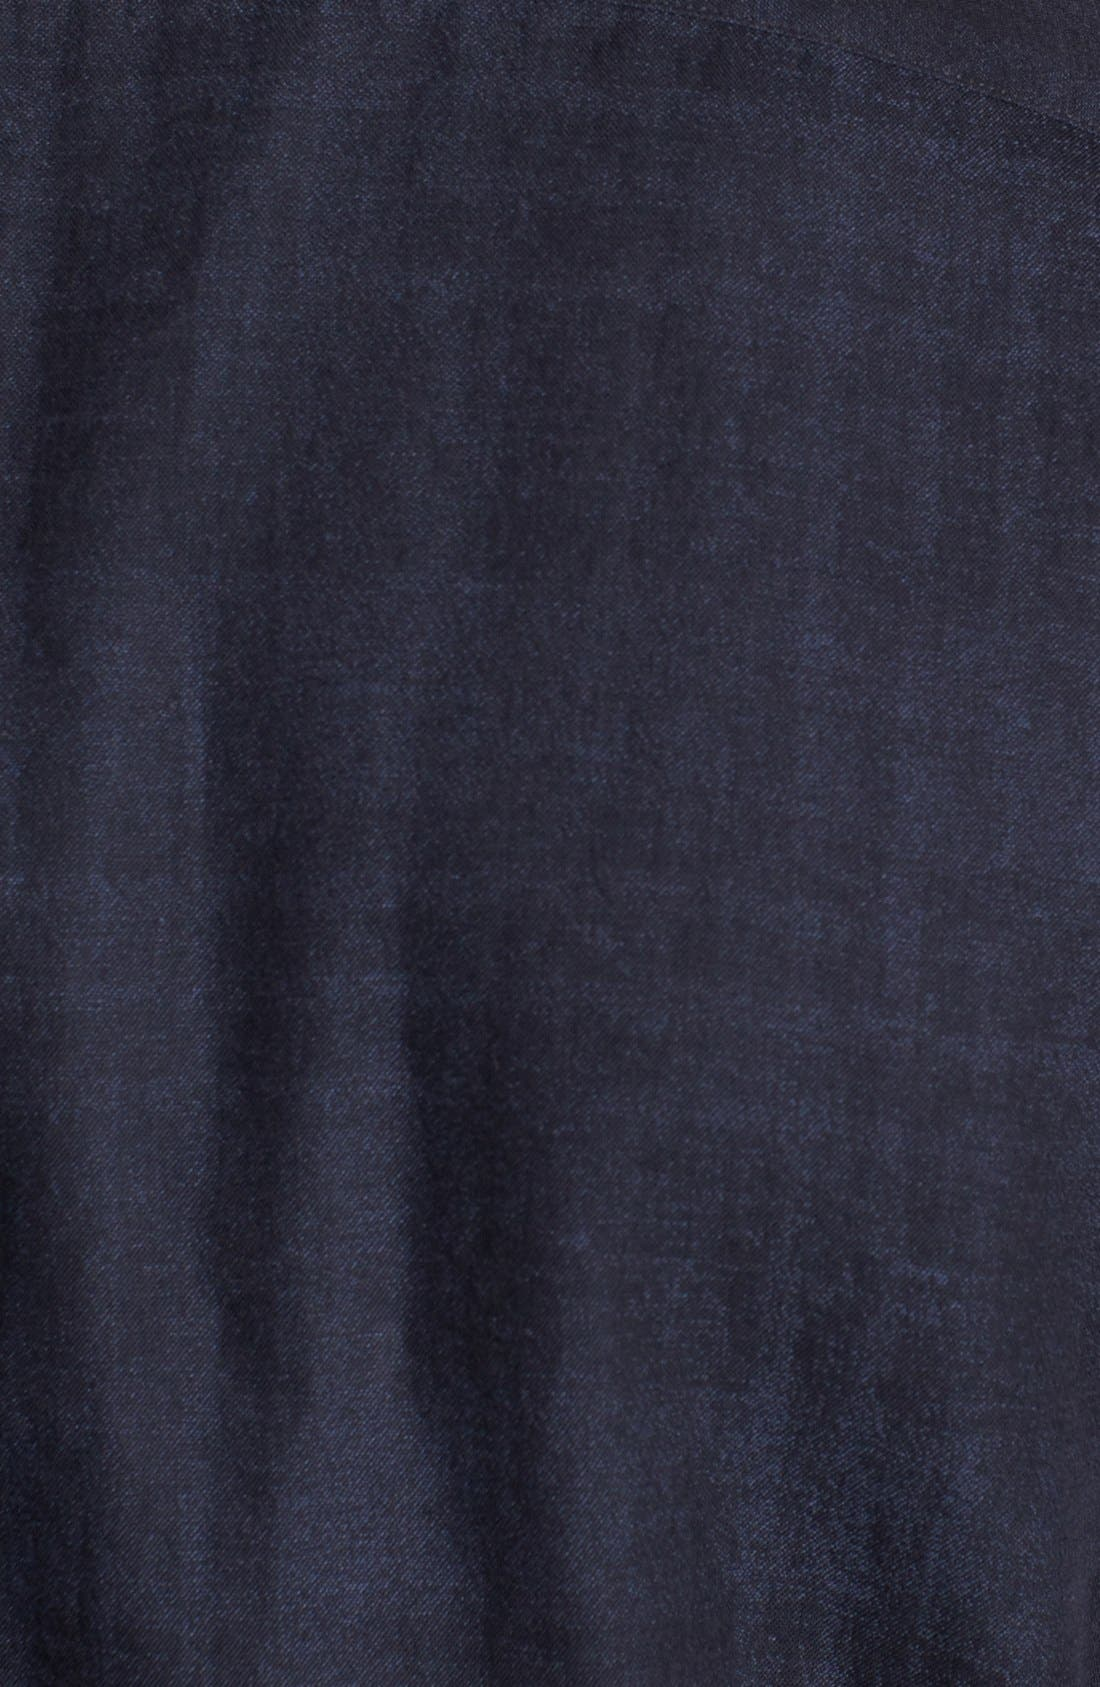 Alternate Image 3  - Theory 'Zack PS Delcro' Trim Fit Sport Shirt